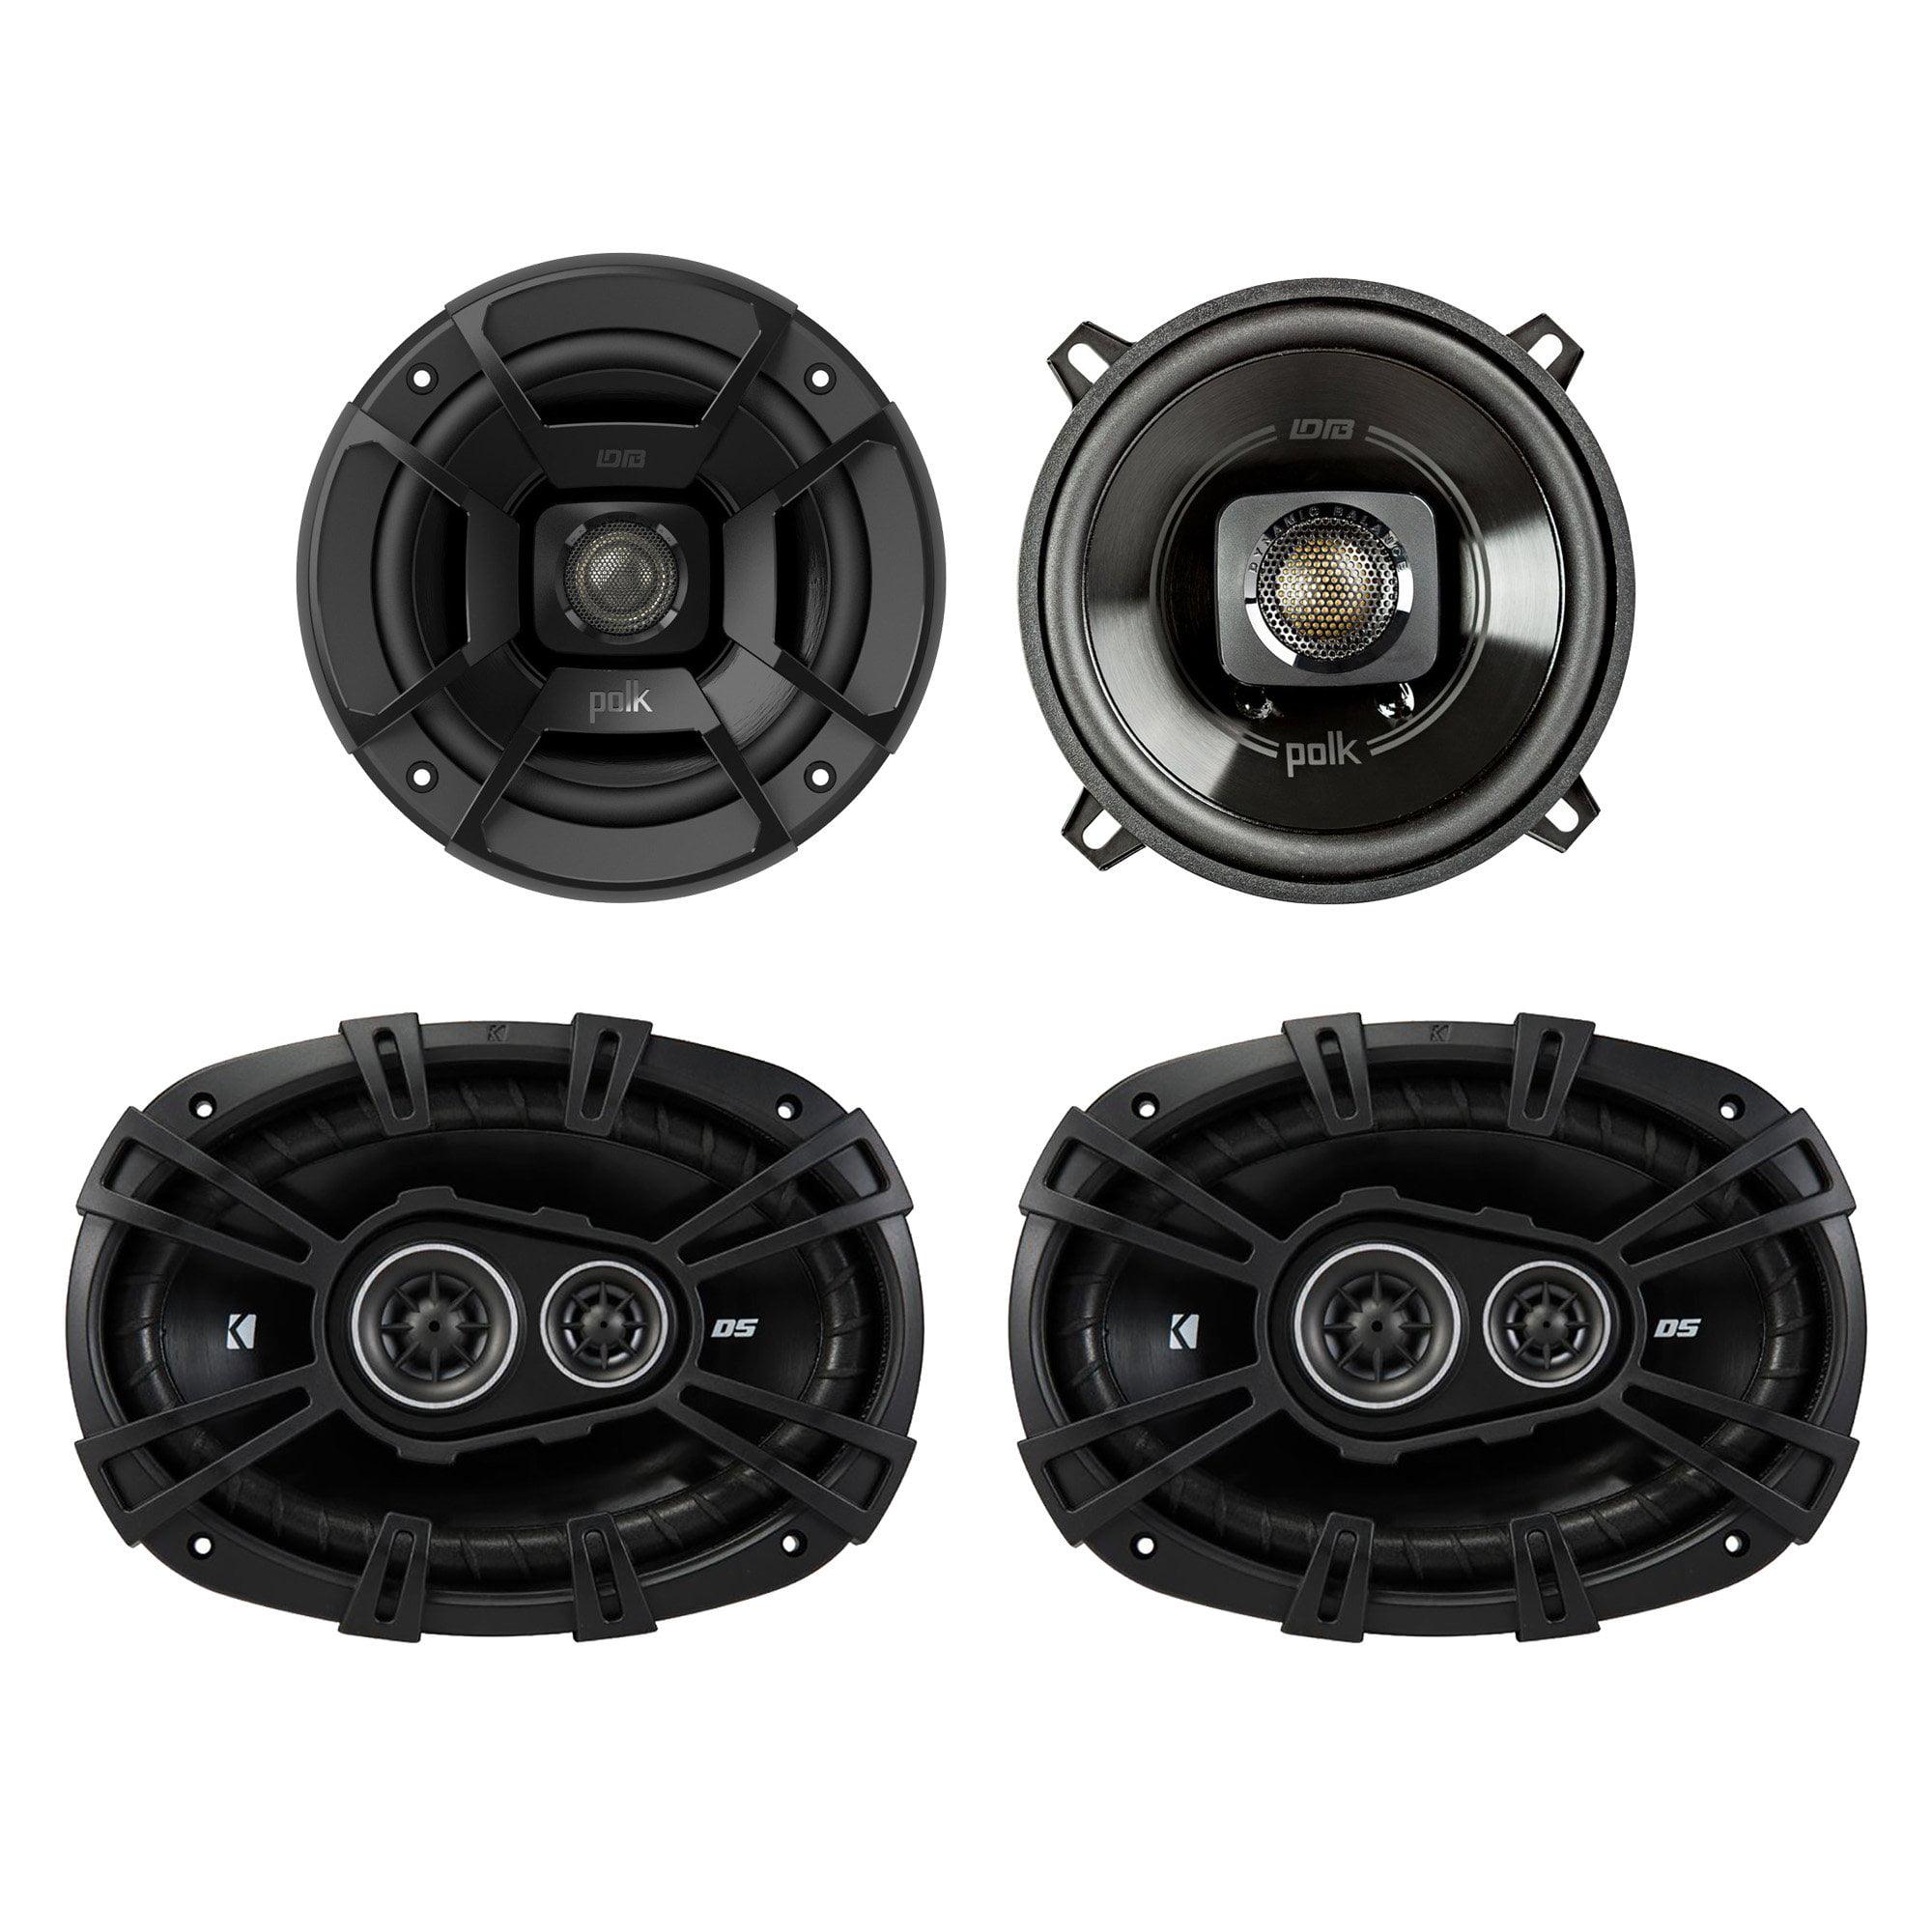 "Polk Audio 5.25"" 300W Car/Marine ATV Speakers, Pair + 6 x 9"" 360W Speakers, Pair"